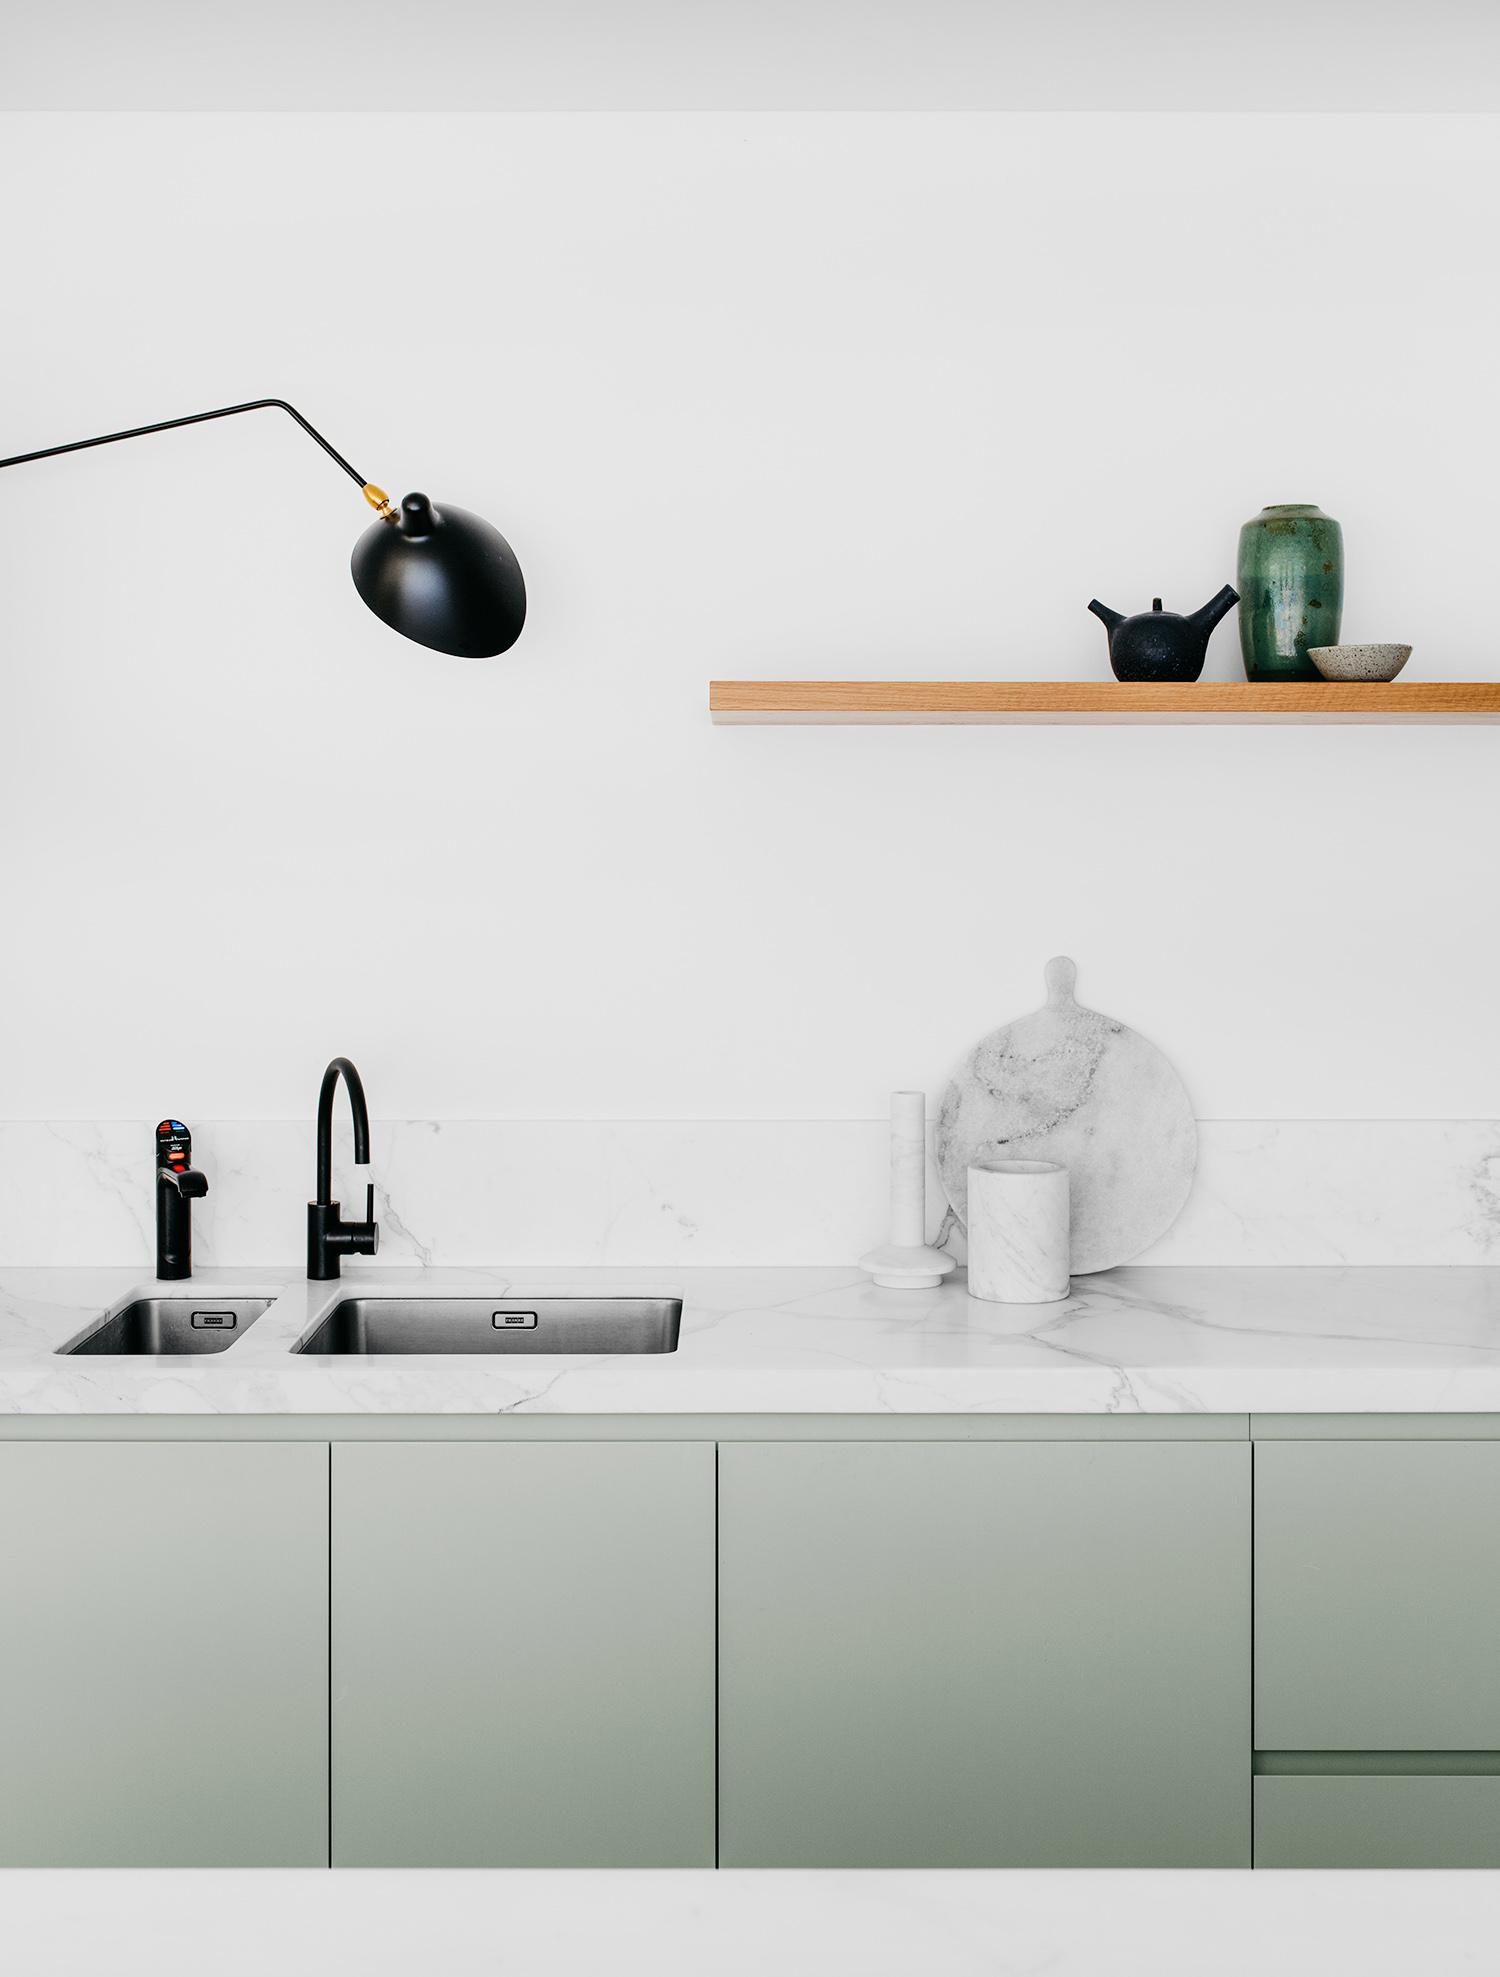 Interior design   Arent&Pyke  /  Photography   Felix Forest